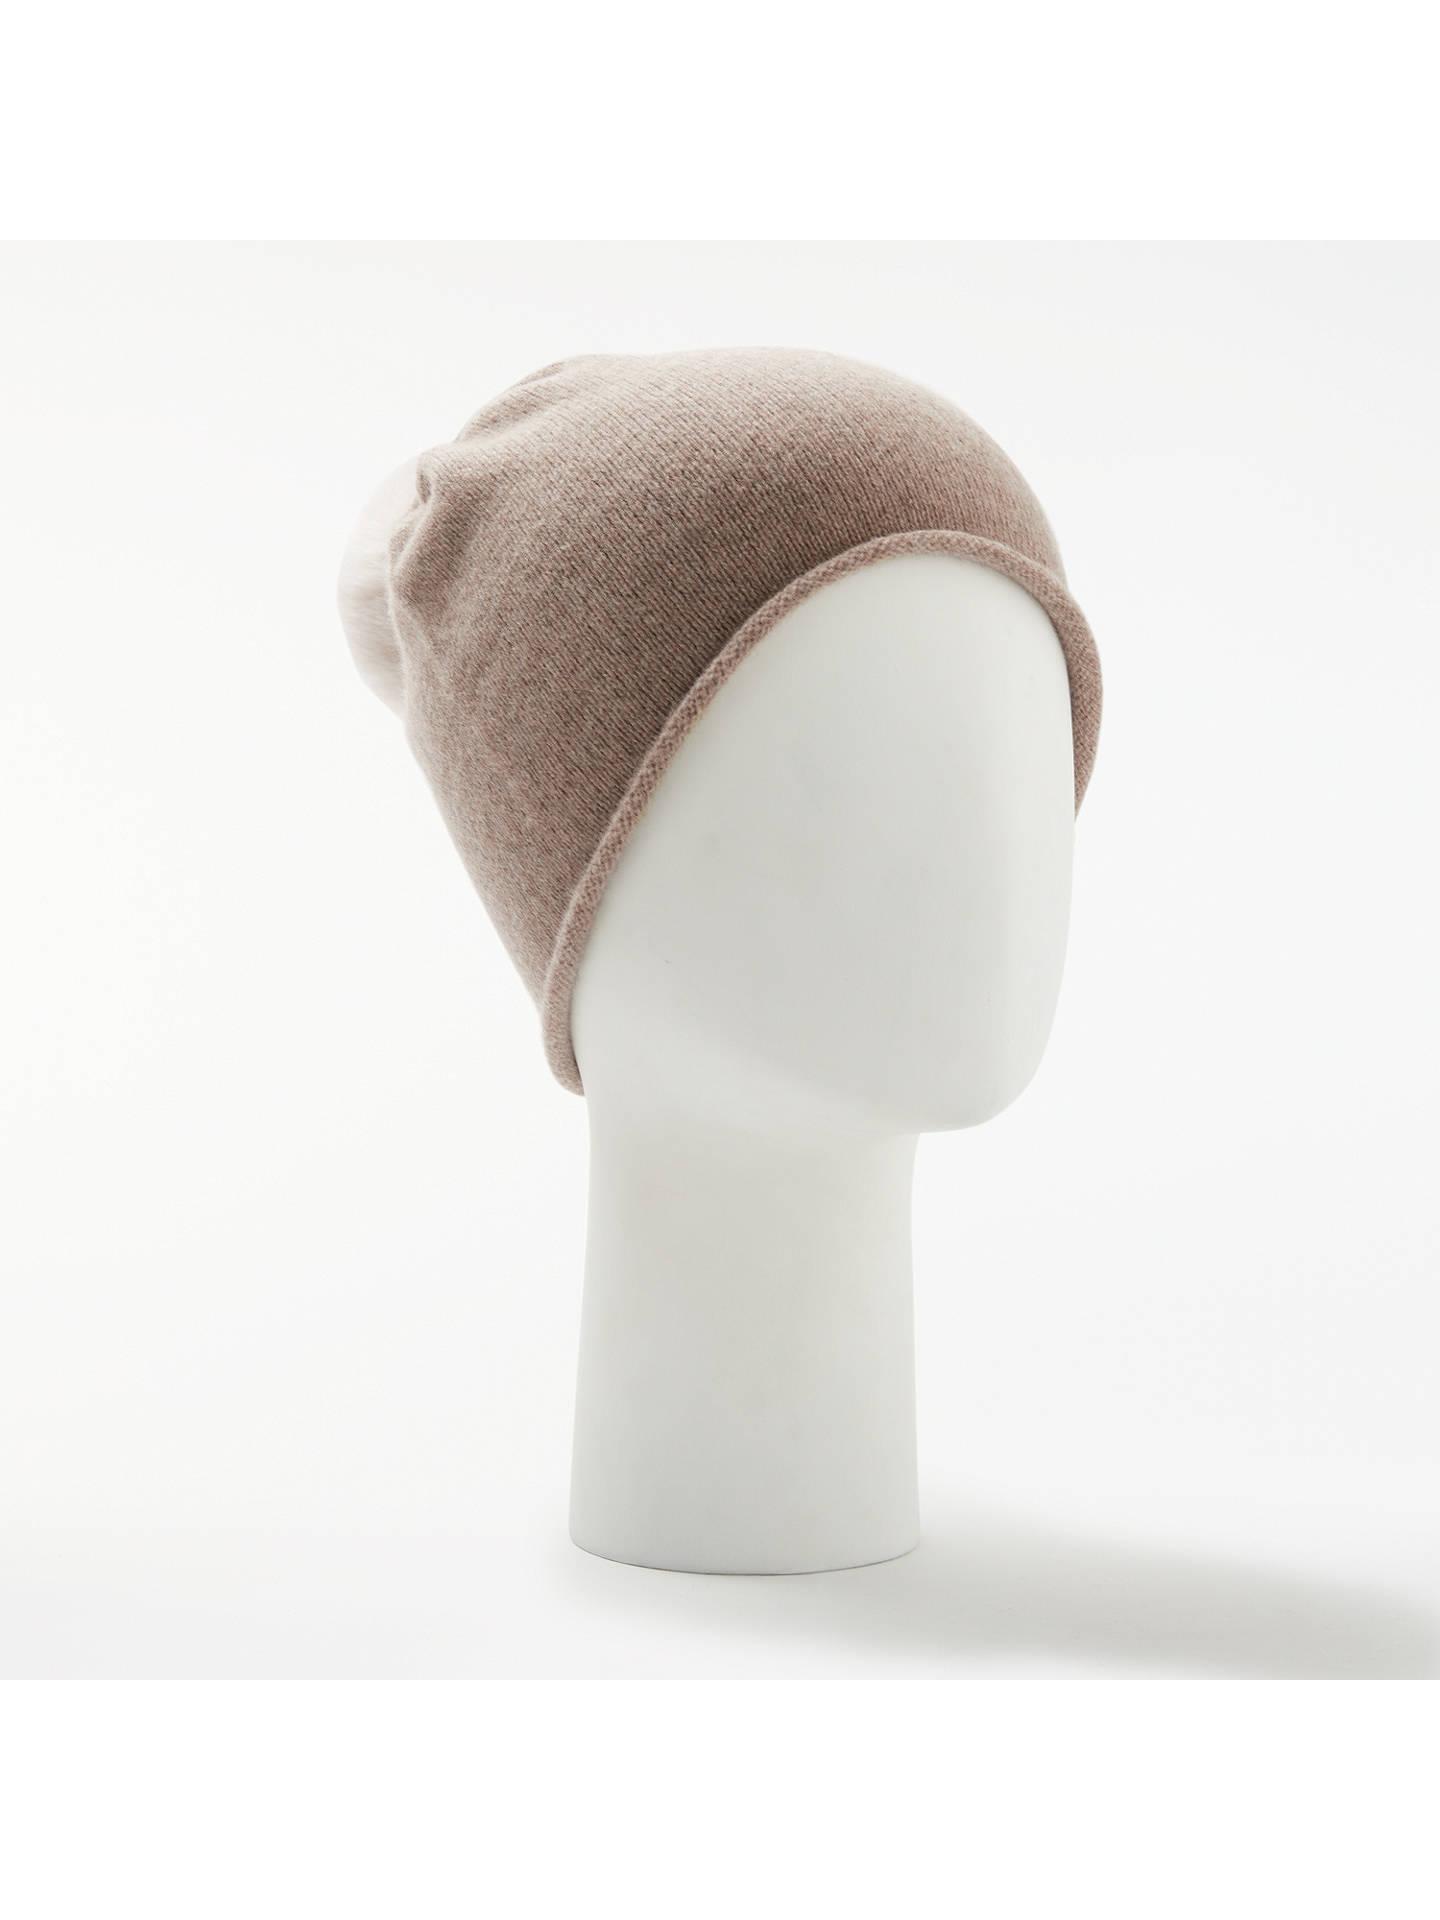 80f918e629d John Lewis   Partners Cashmere Bobble Beanie Hat at John Lewis ...